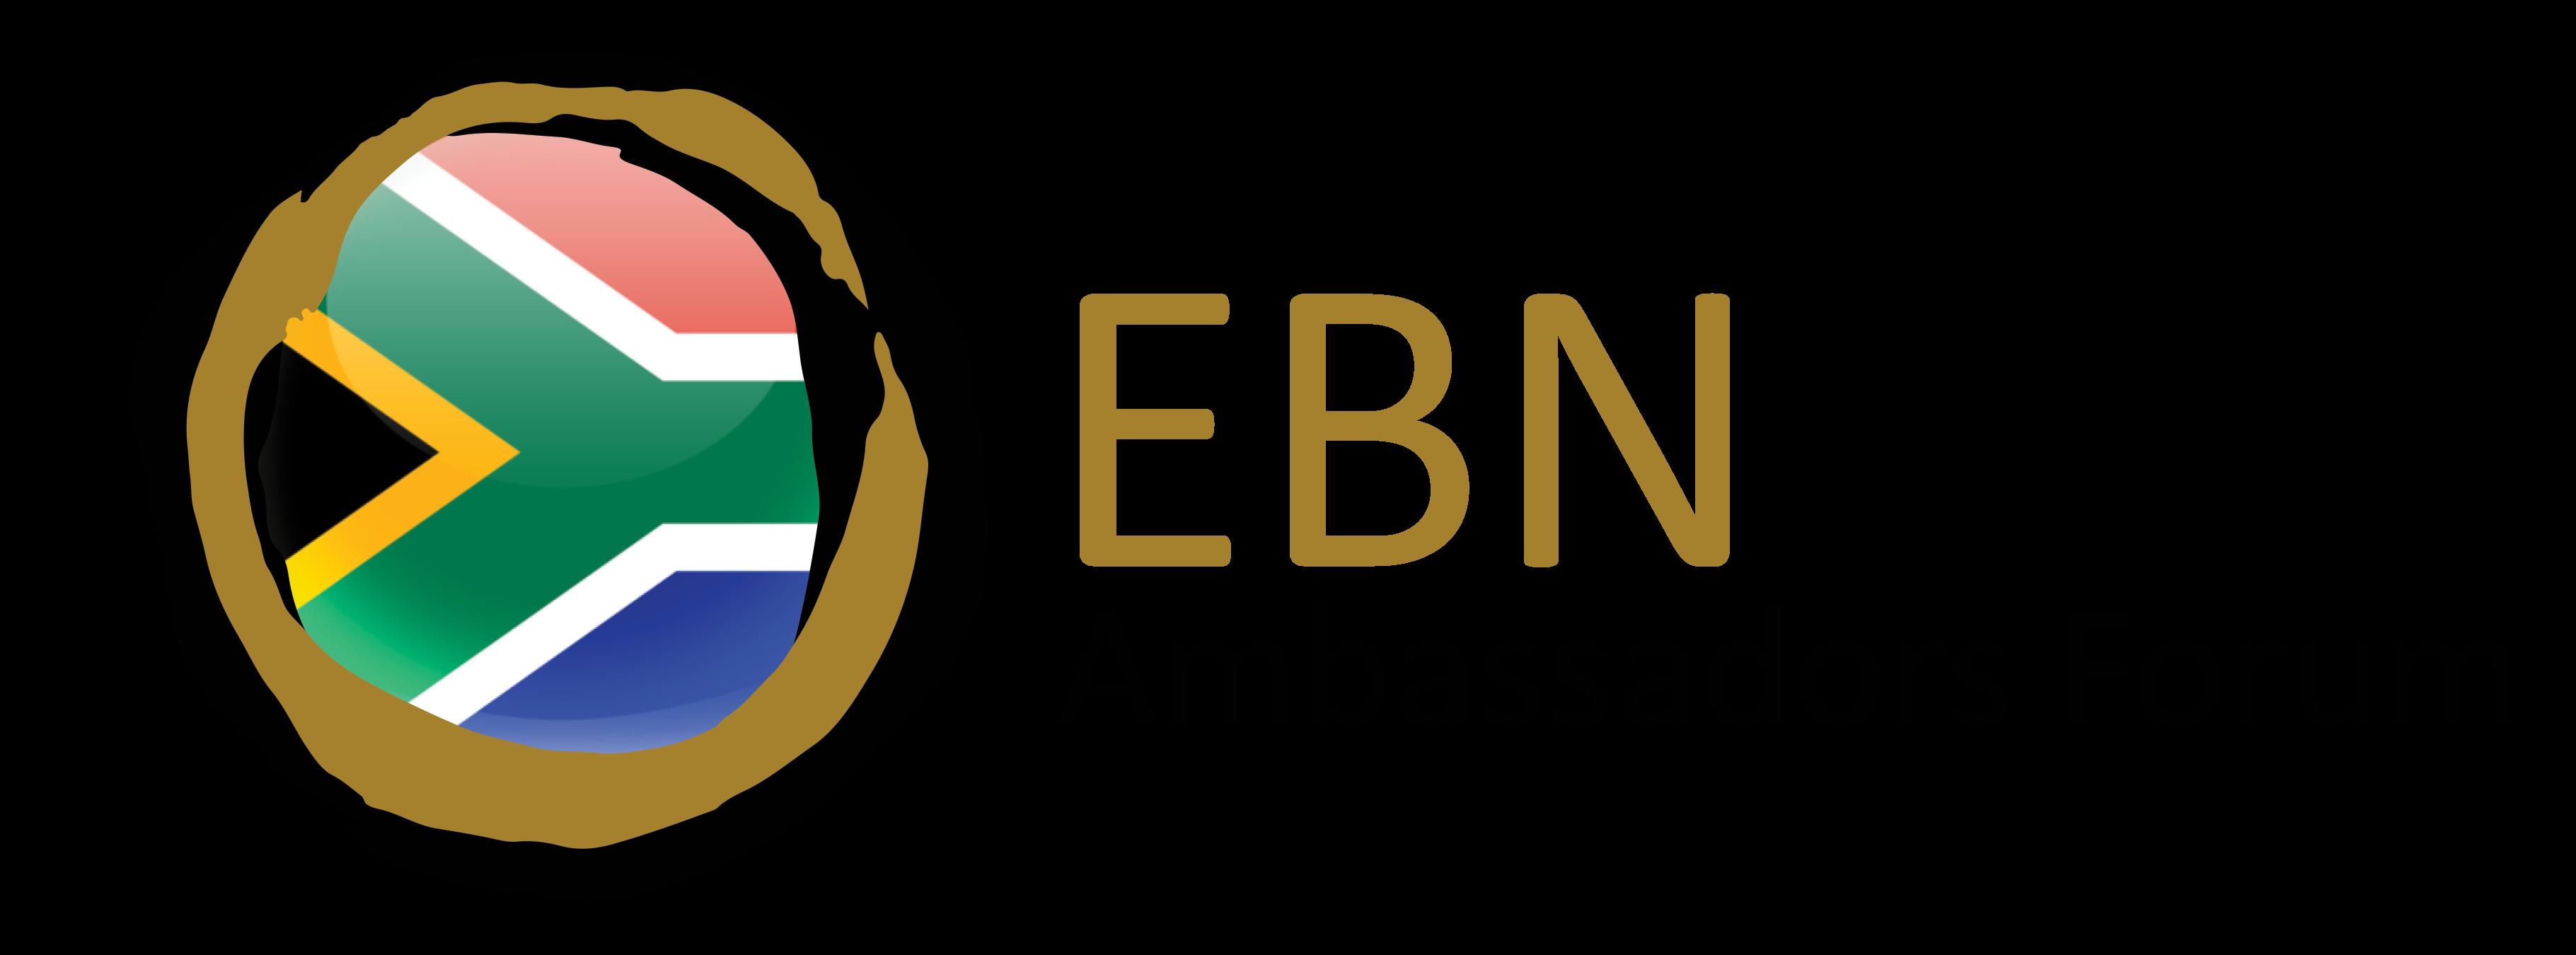 EBN AMBASSADORS FORUM LOGO